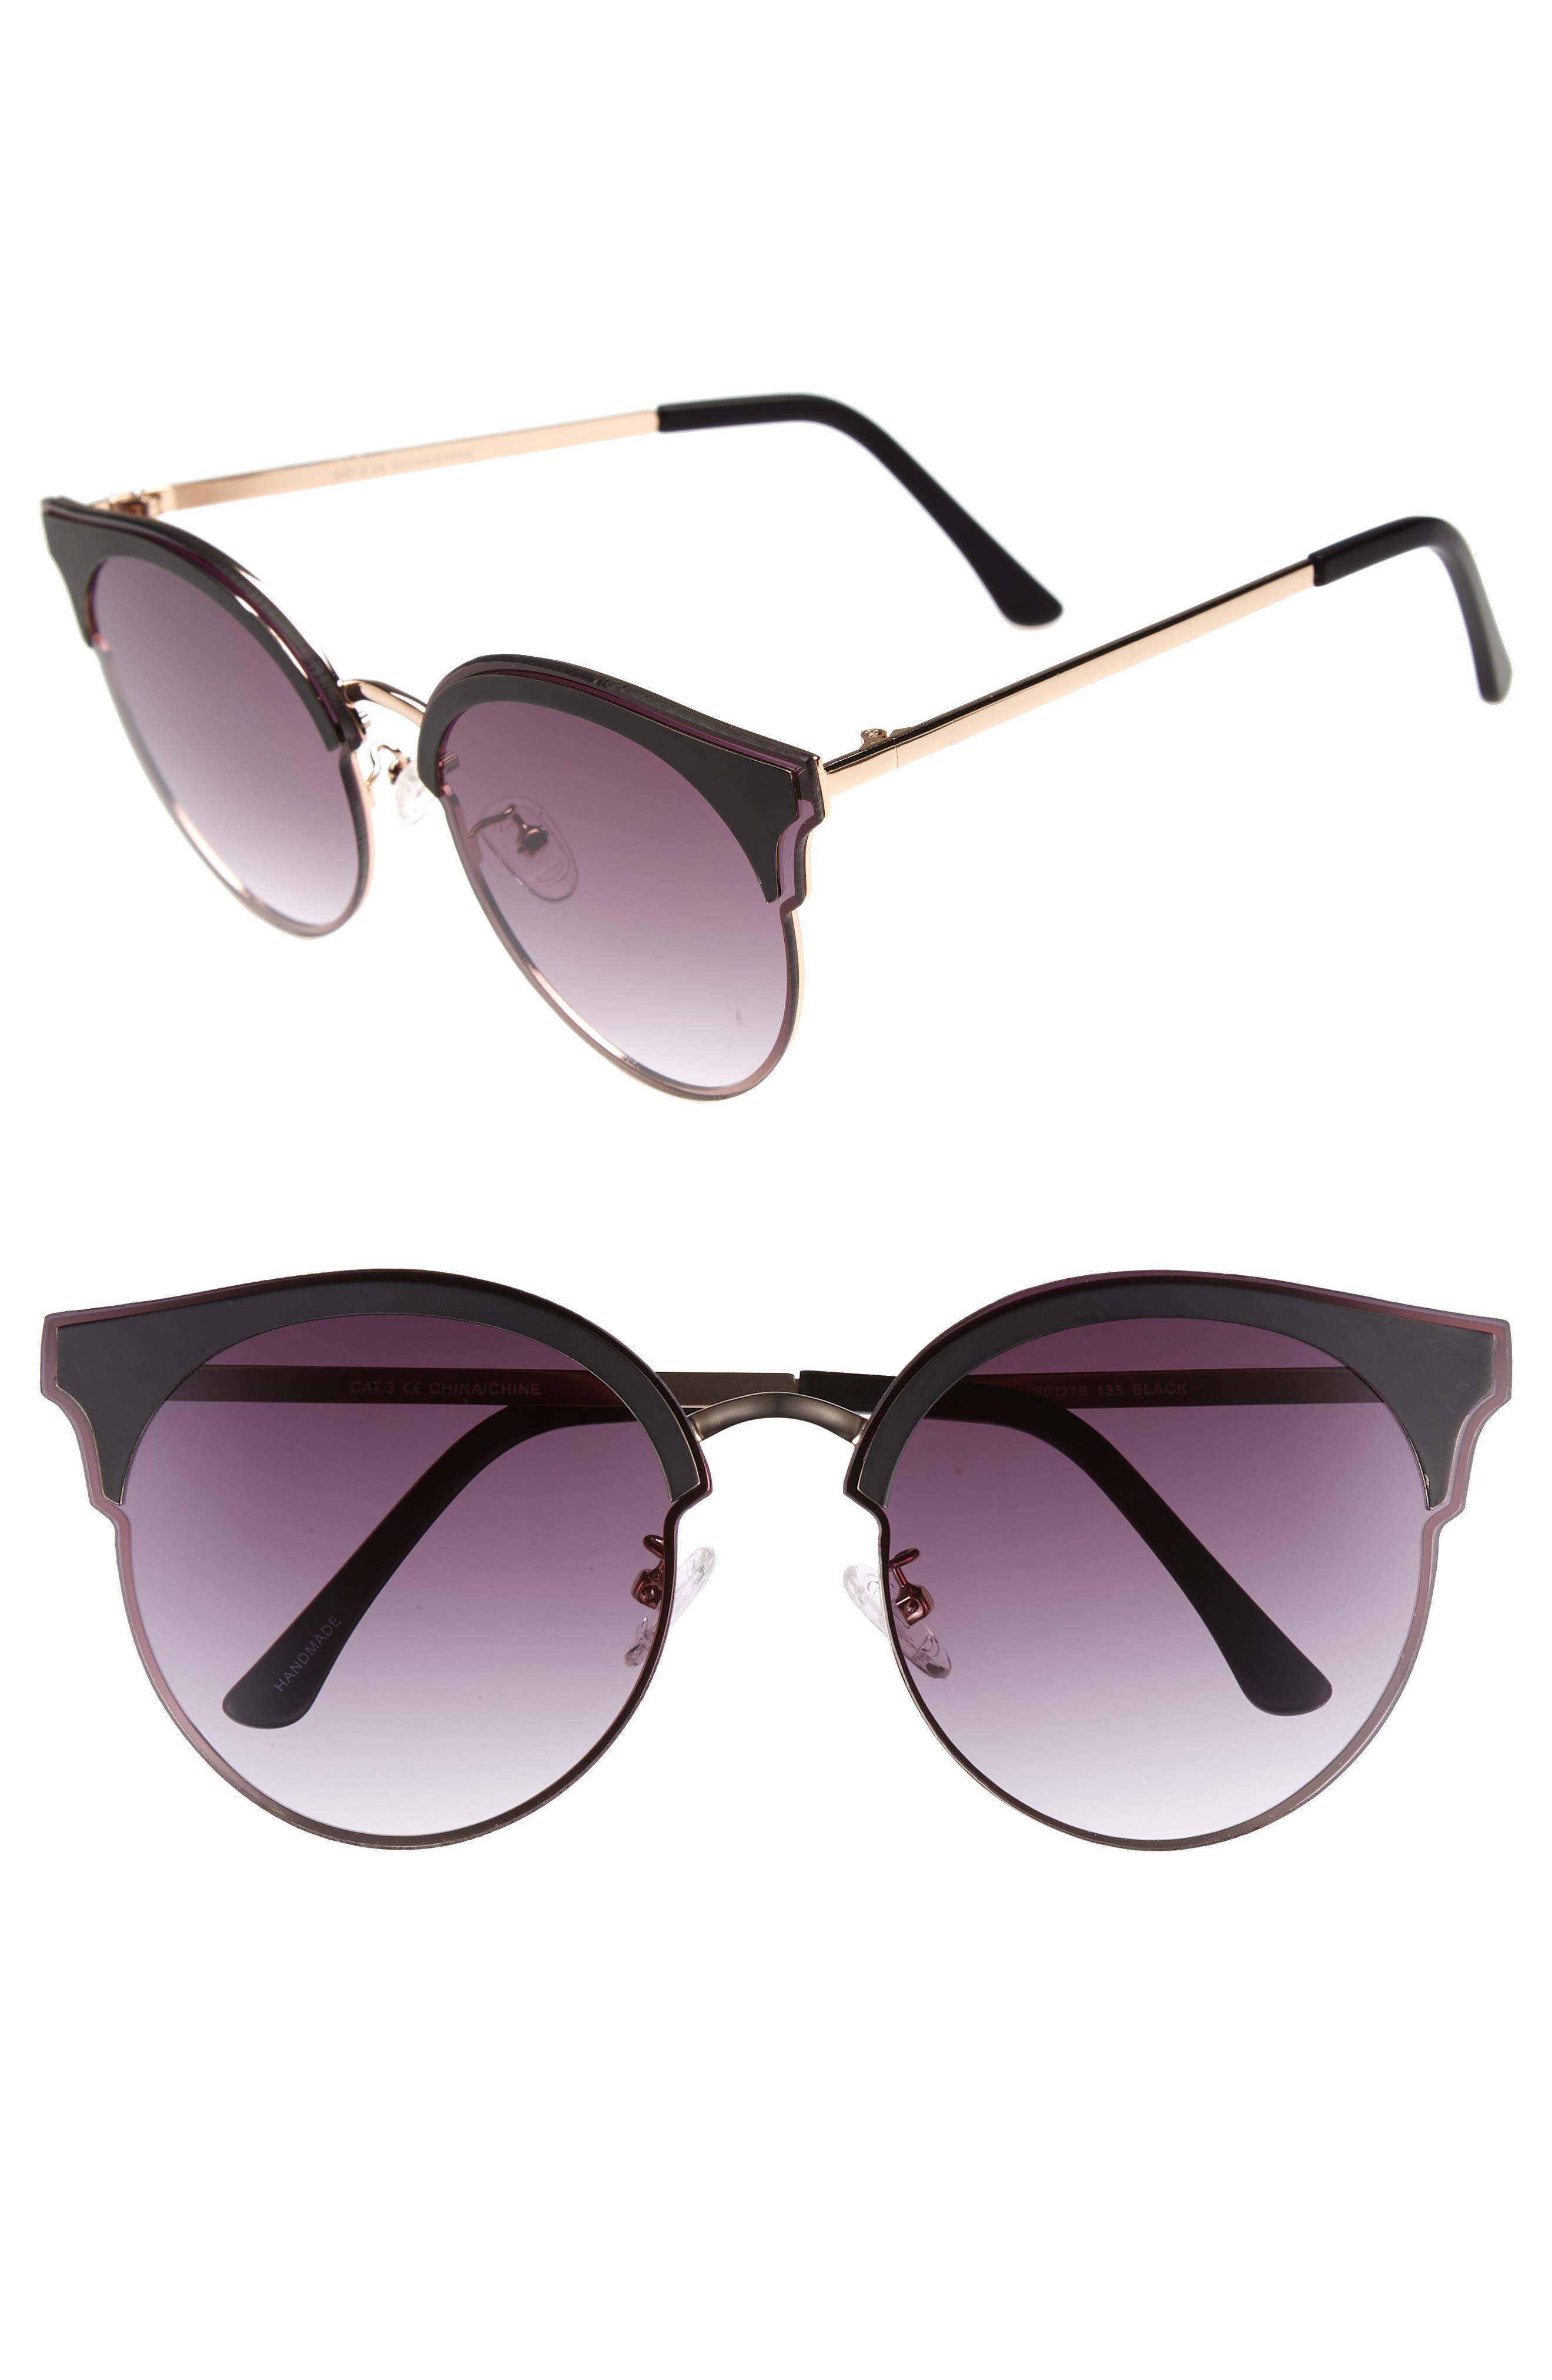 Mia 60mm Sunglasses,                             Main thumbnail 1, color,                             Matte Black